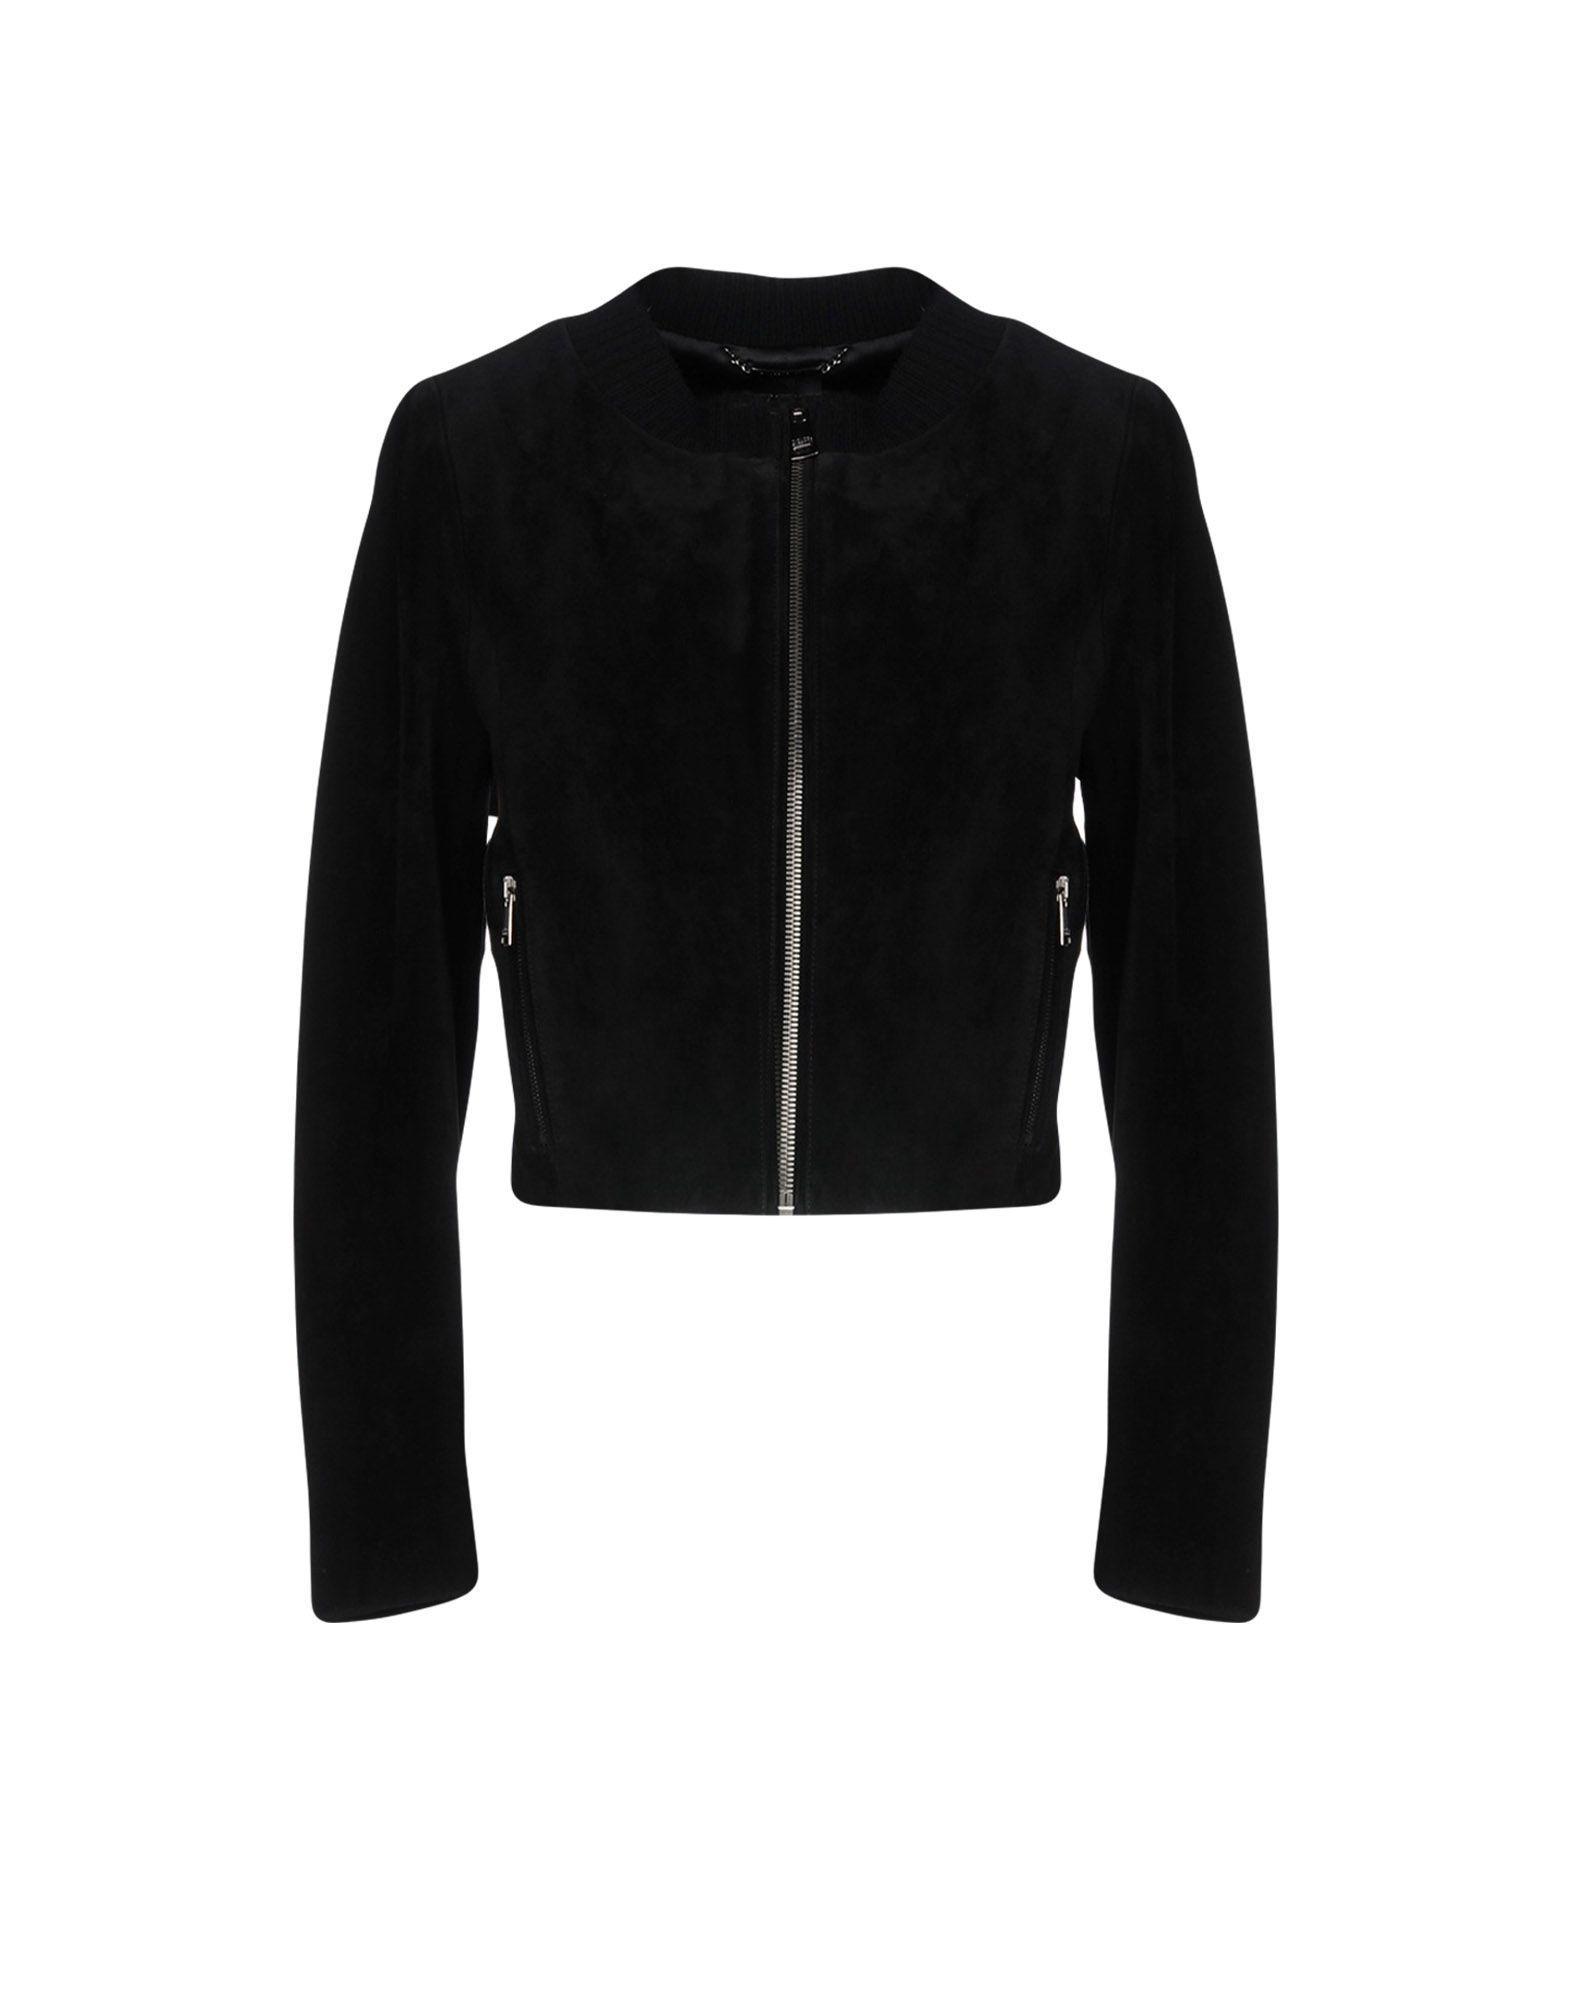 Dolce & Gabbana Biker Jacket In Black